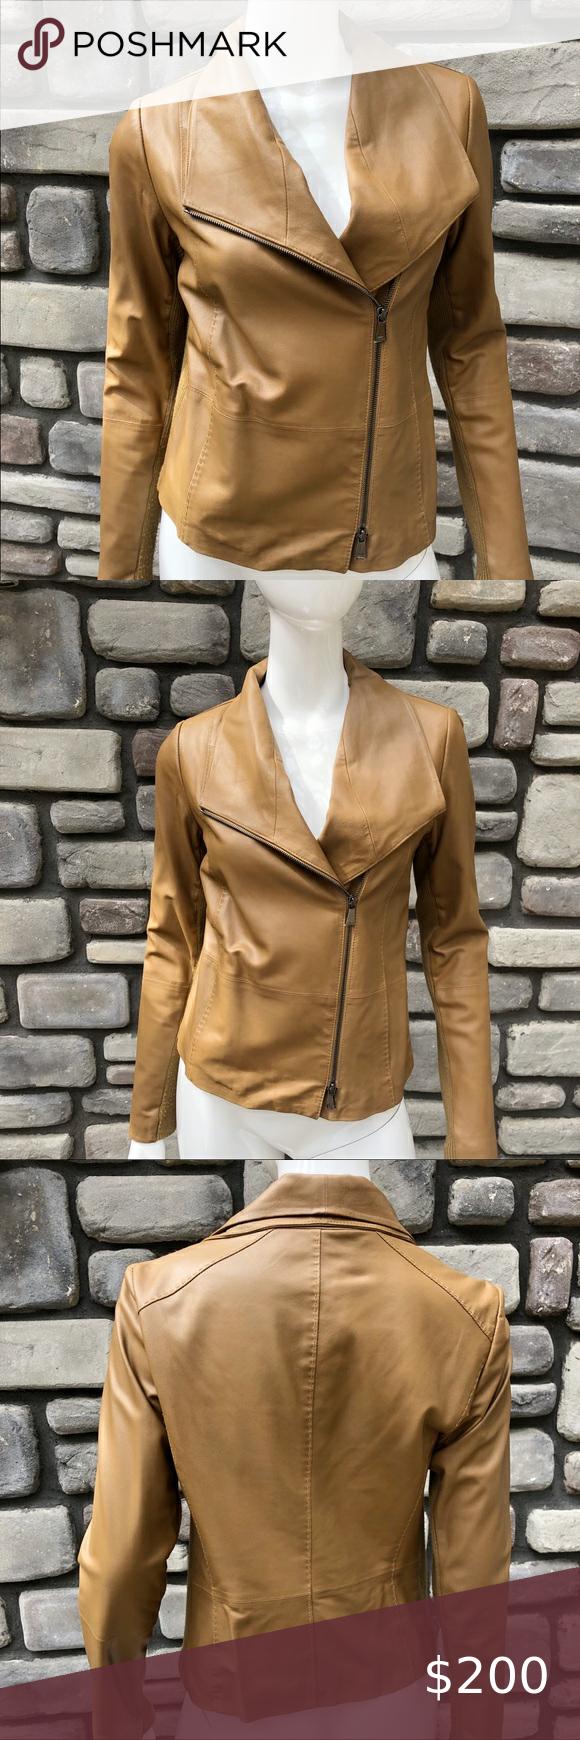 Vince Camuto Scuba Style Leather Jacket M Clothes Design Fashion Leather Jacket [ 1740 x 580 Pixel ]